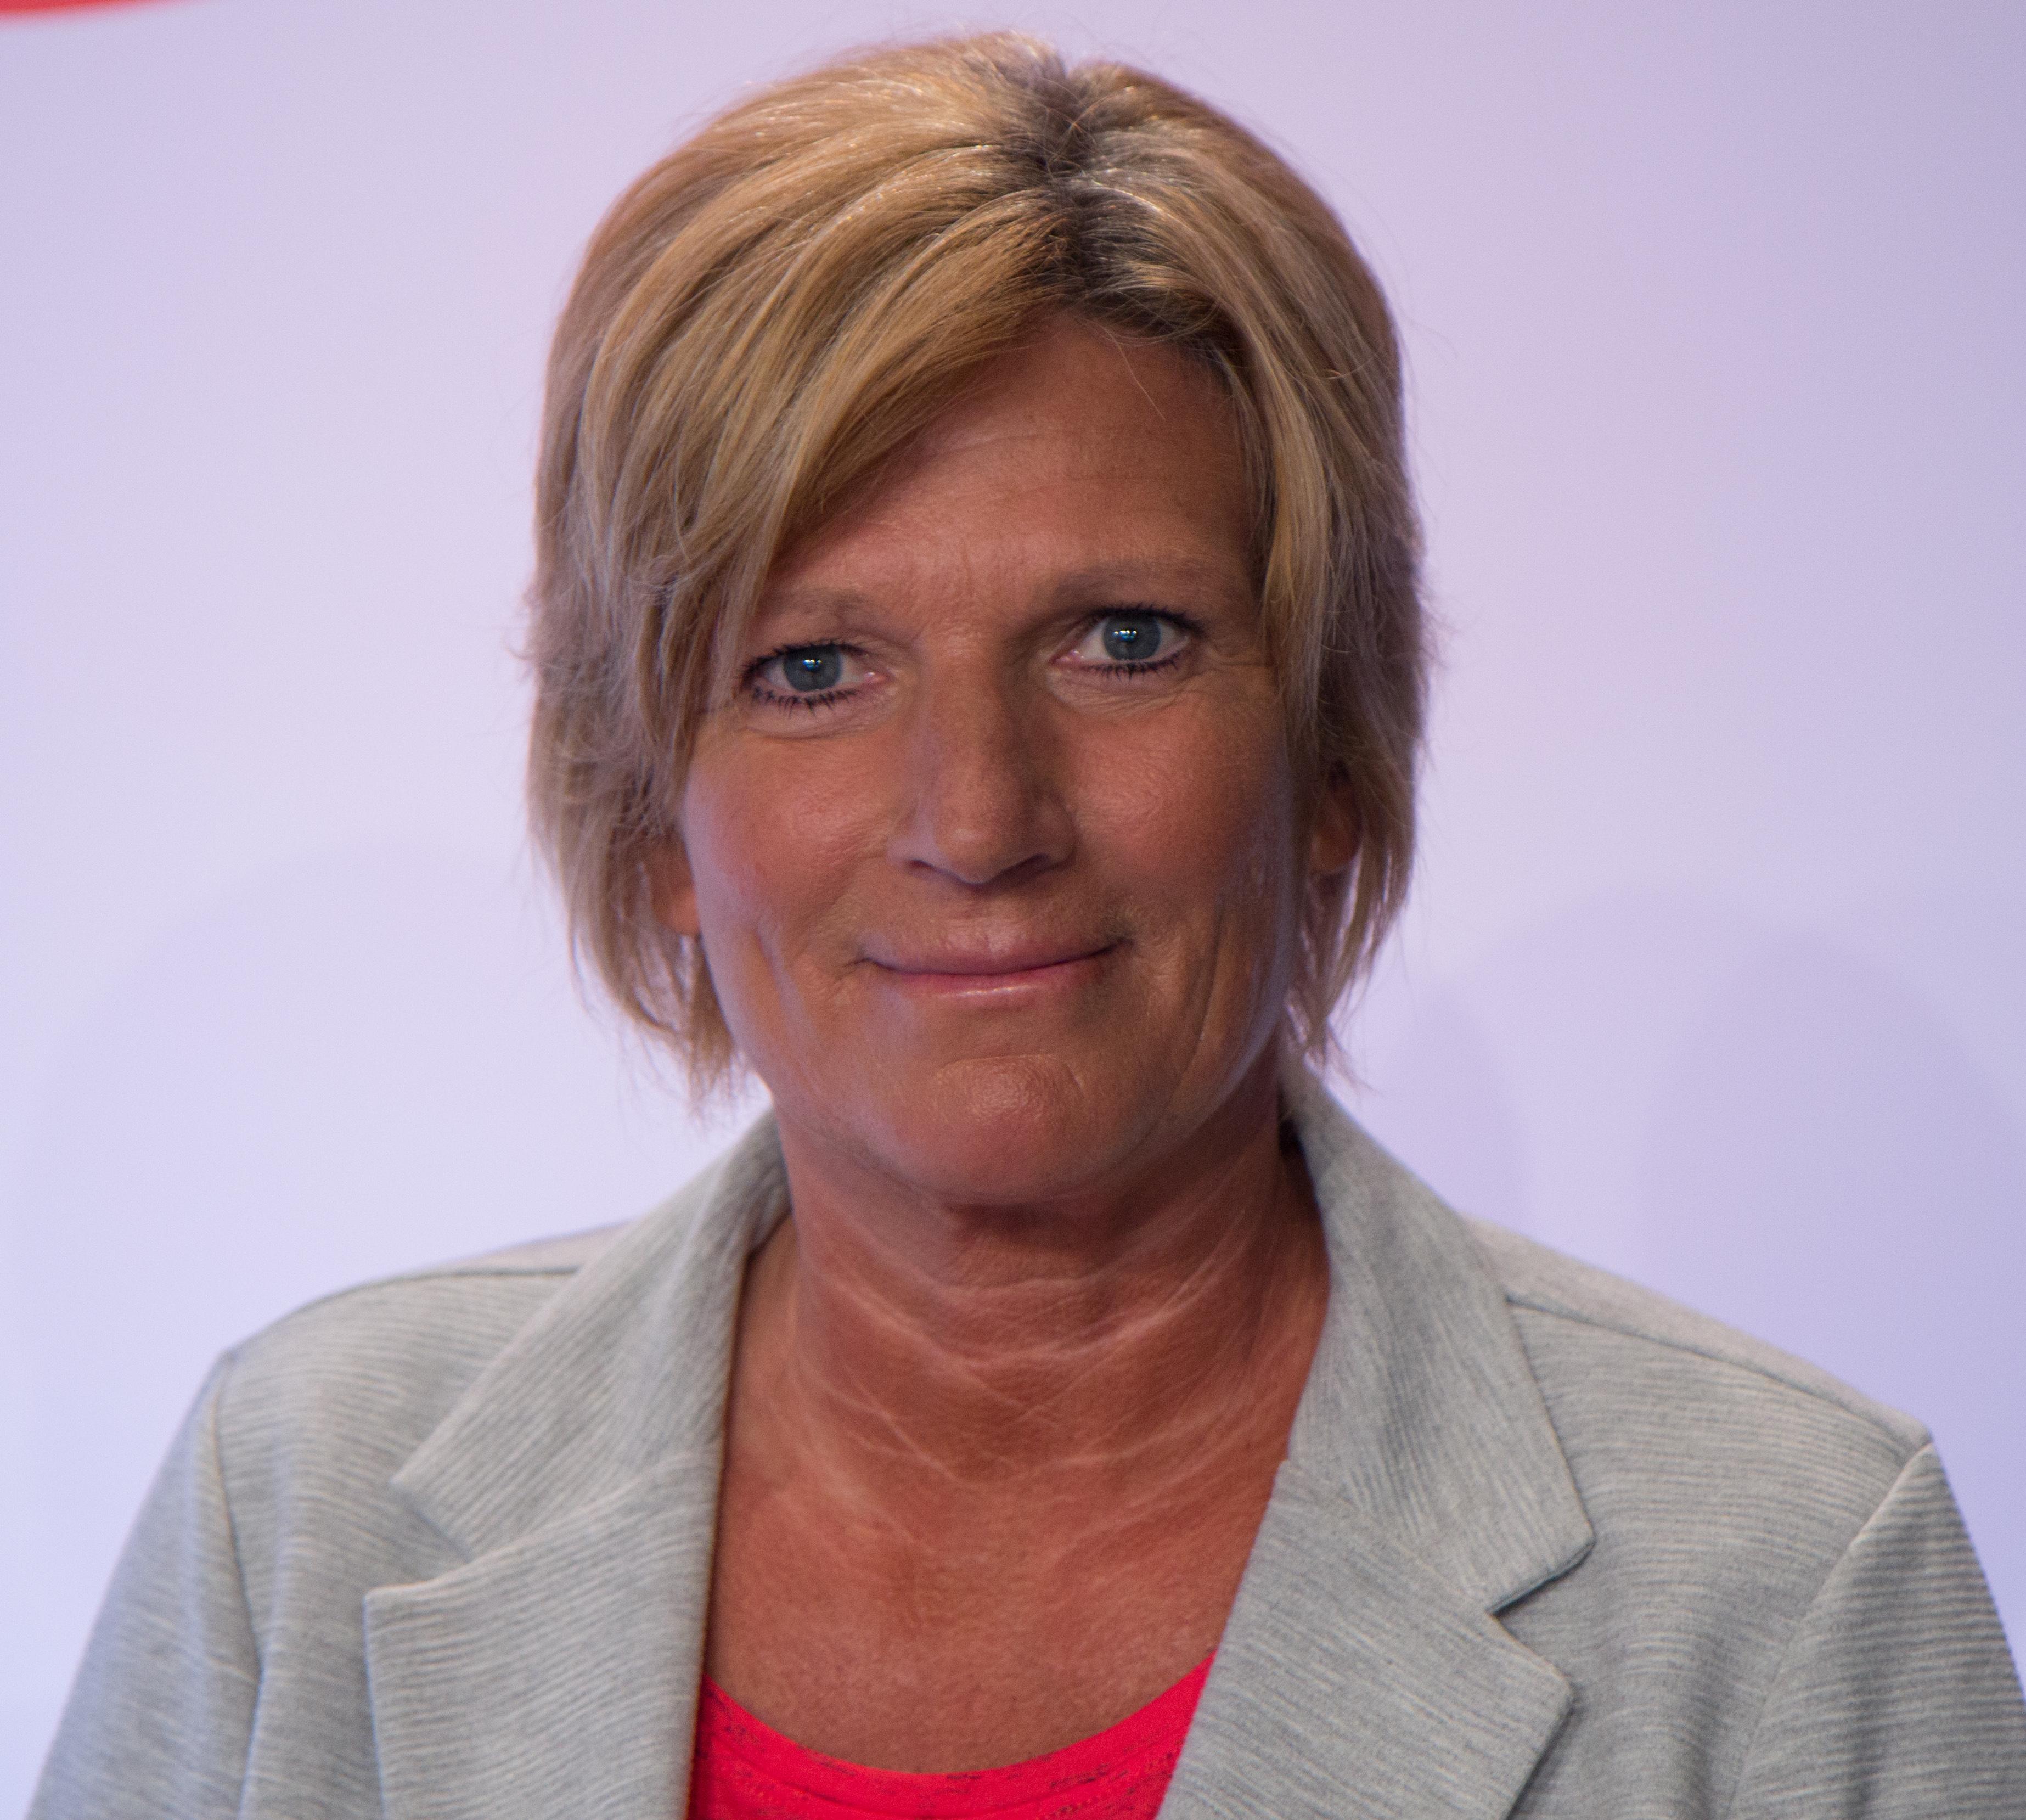 Claudia Neumann Wikipedia